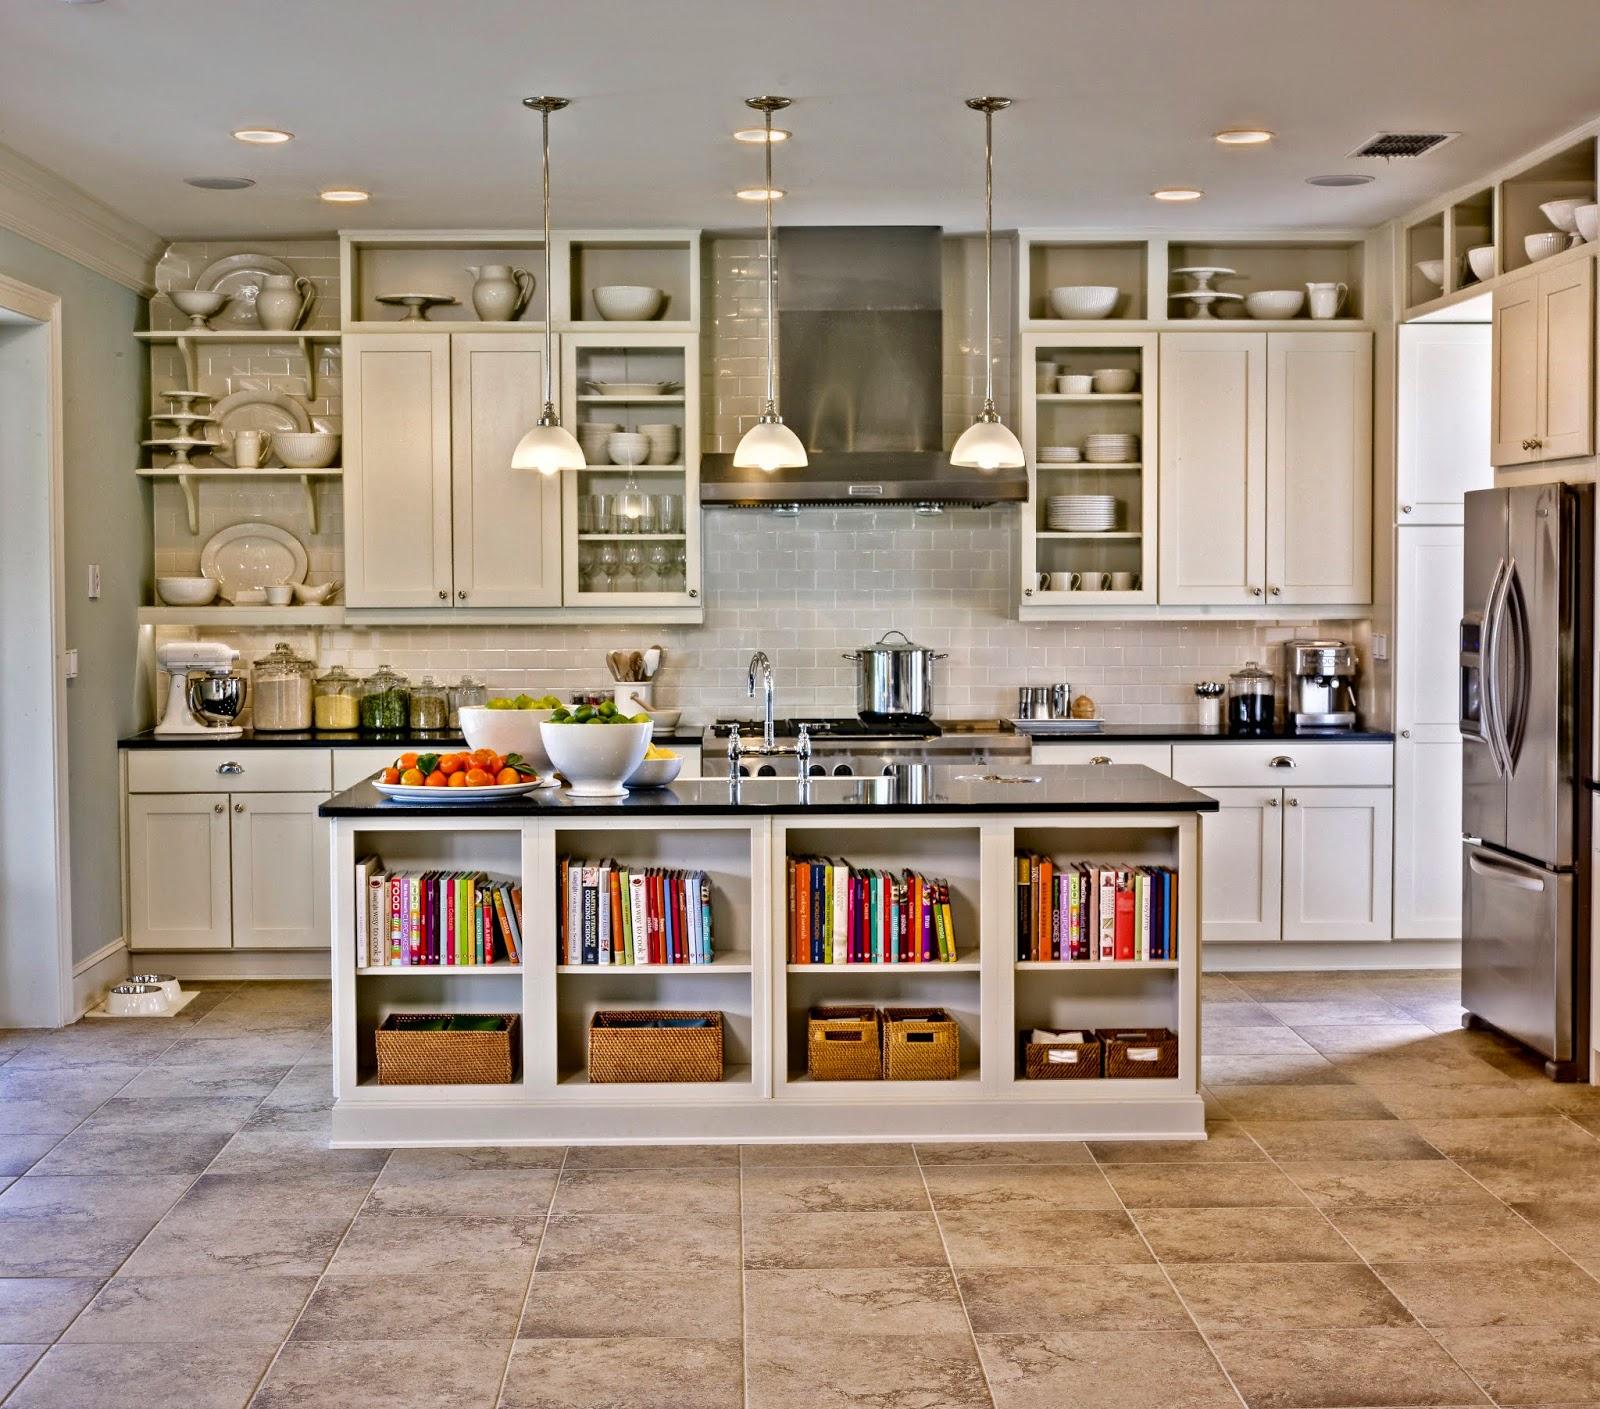 Storage ideas for every kitchen.   Interiors Blog